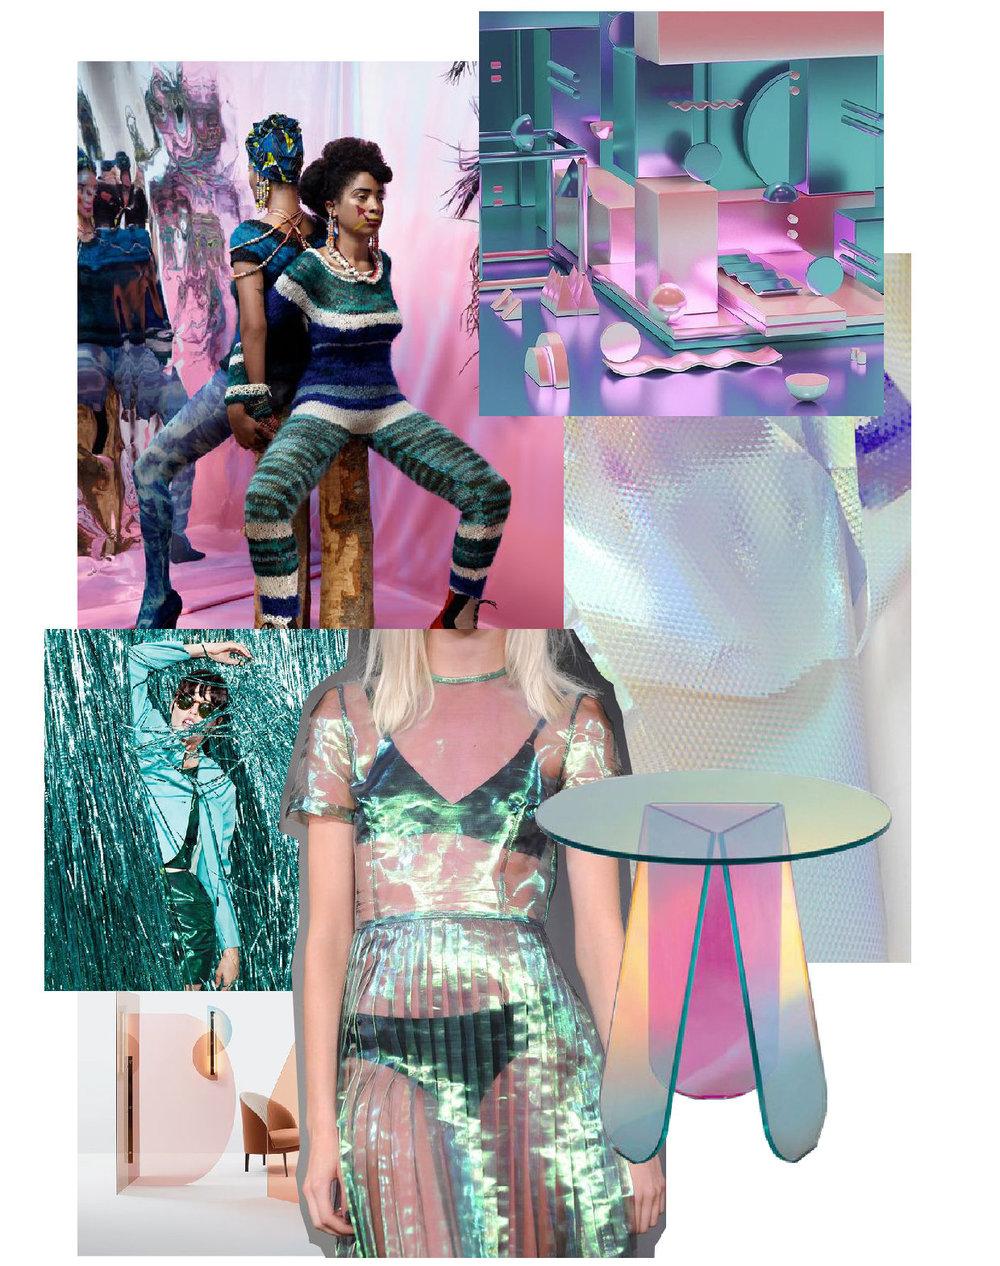 From left, clockwise: NAMSA LEUBA , 3dfordesigners.com , Berta Fischer , Shimmer tavoli - Glas Italia , Last Dance Holographic Dress , Vela Paravent from Arflex , designlovefest